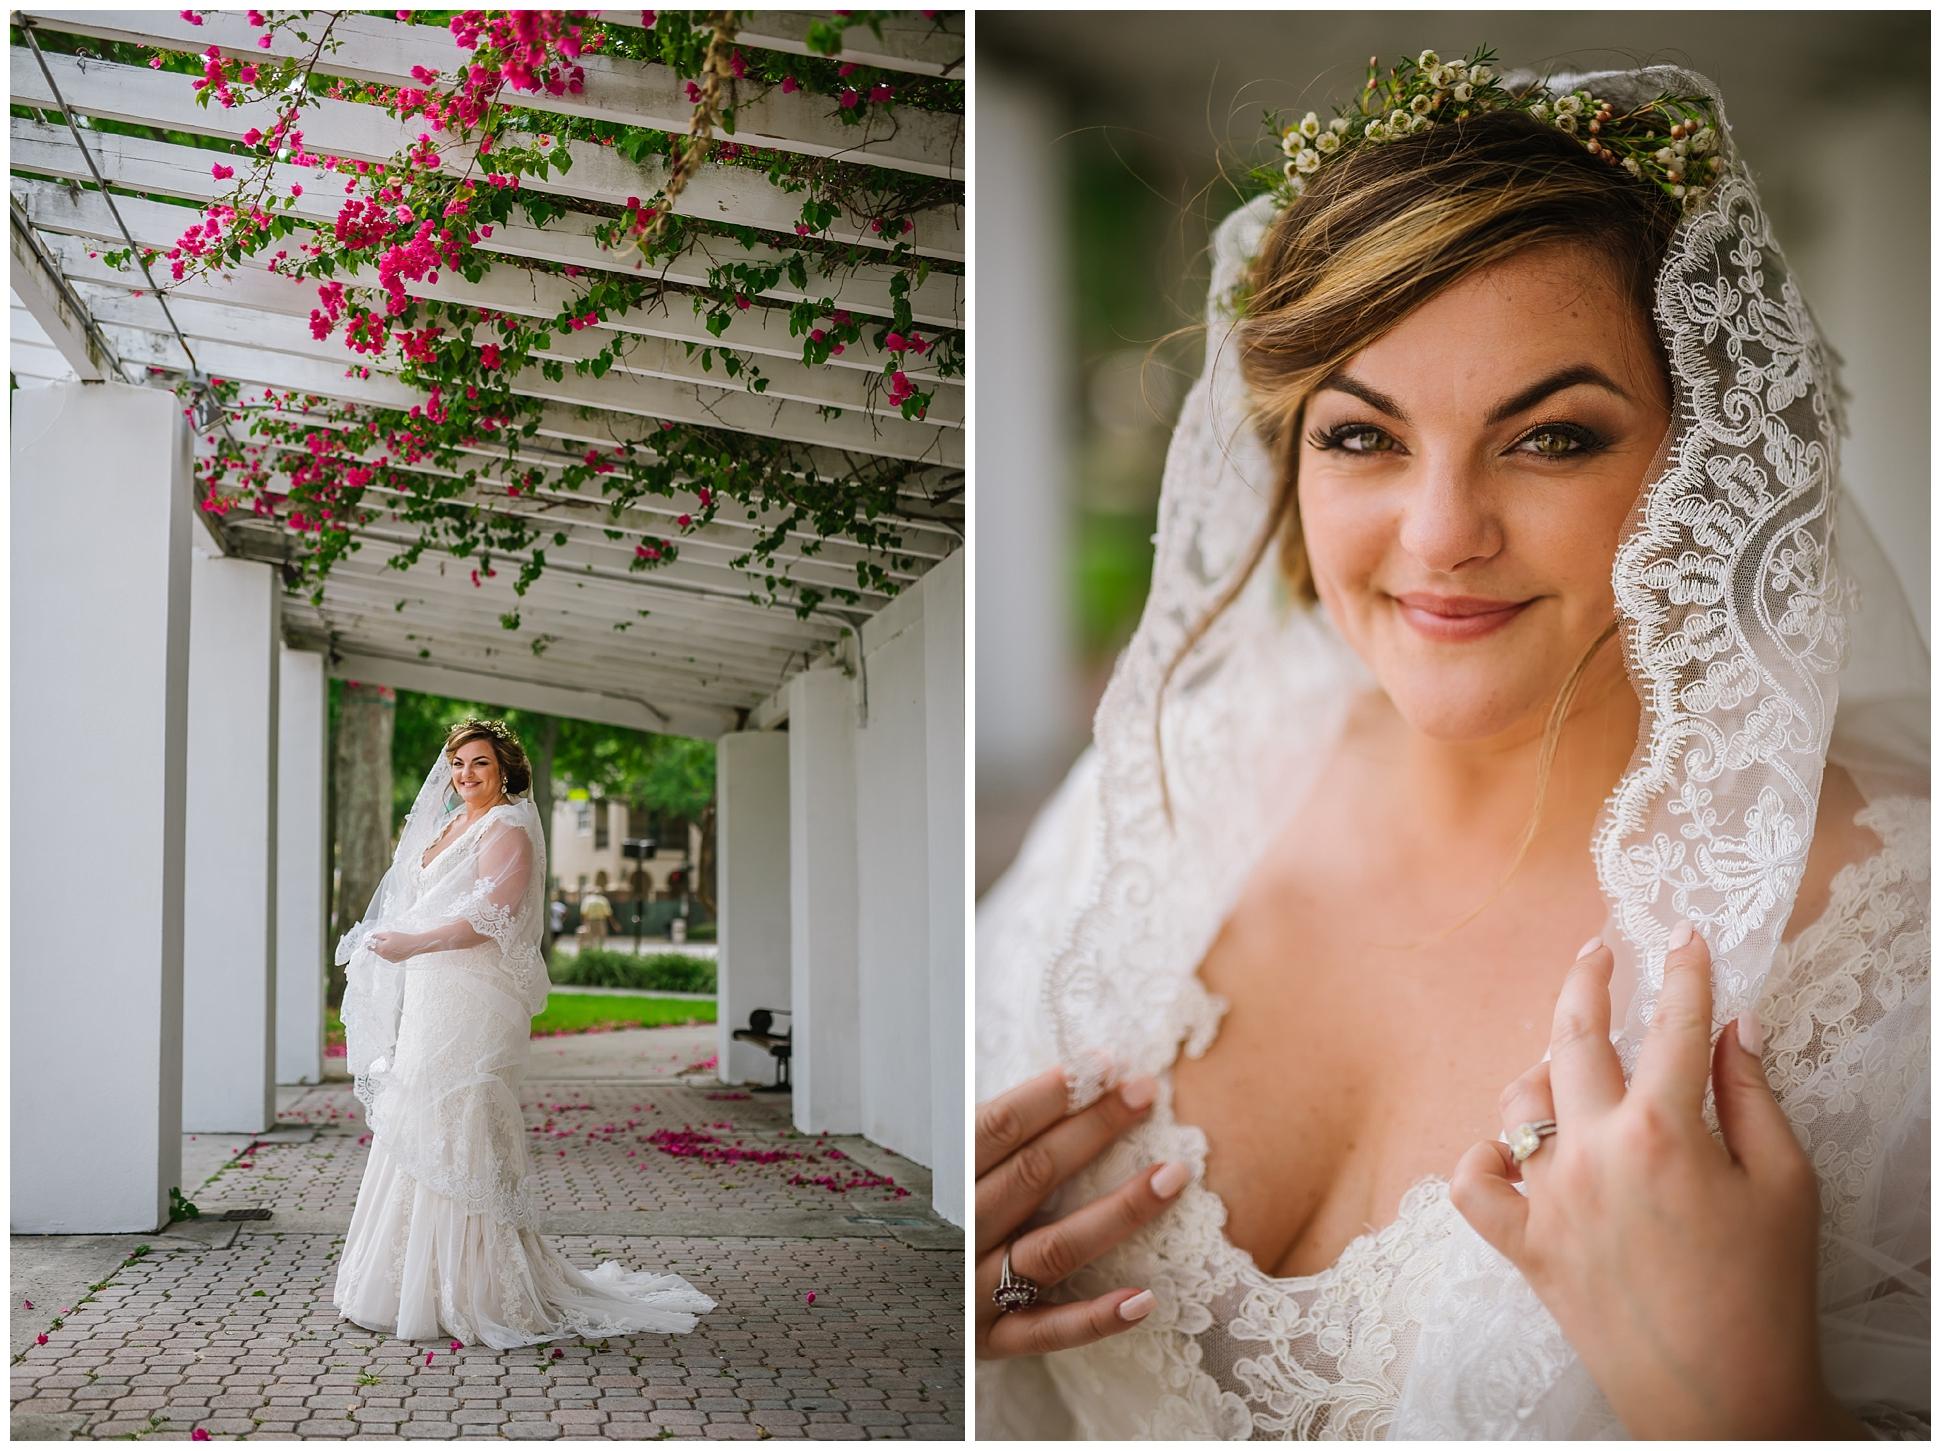 st-pete-wedding-photographer-italian-romance-theme-rustic-flower-crown_0416.jpg